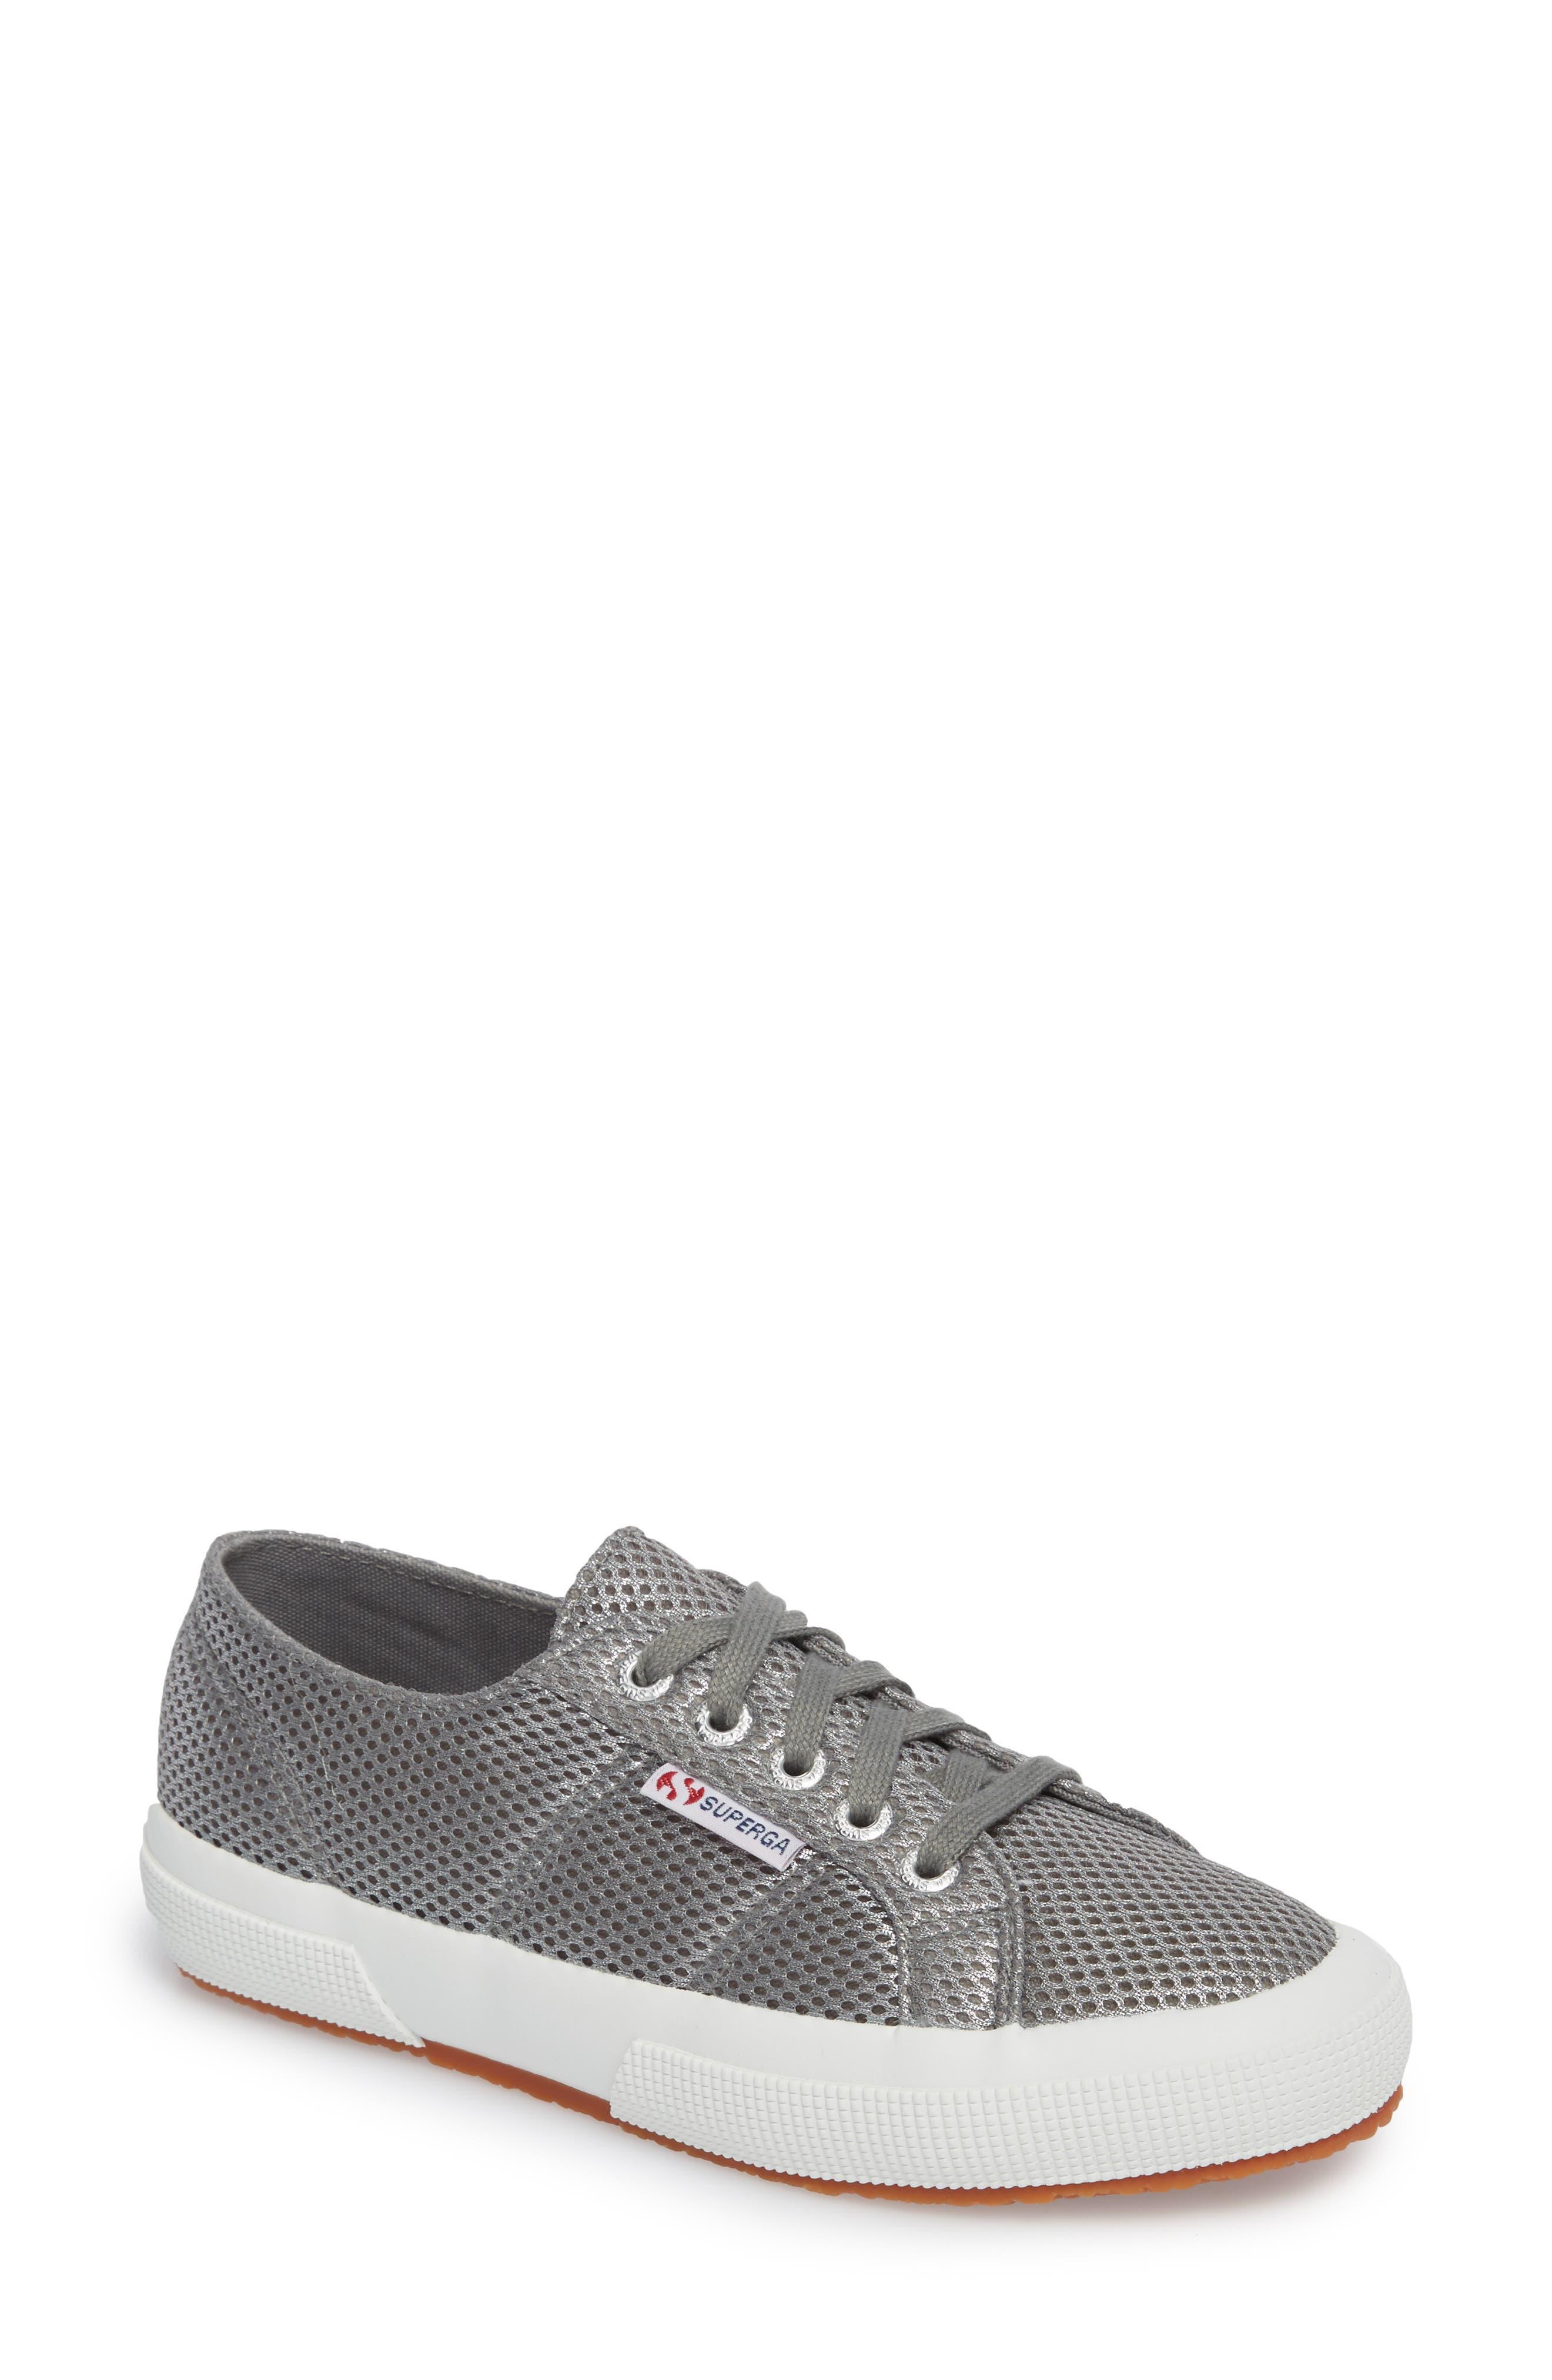 2750 Metallic Sneaker,                             Main thumbnail 1, color,                             044